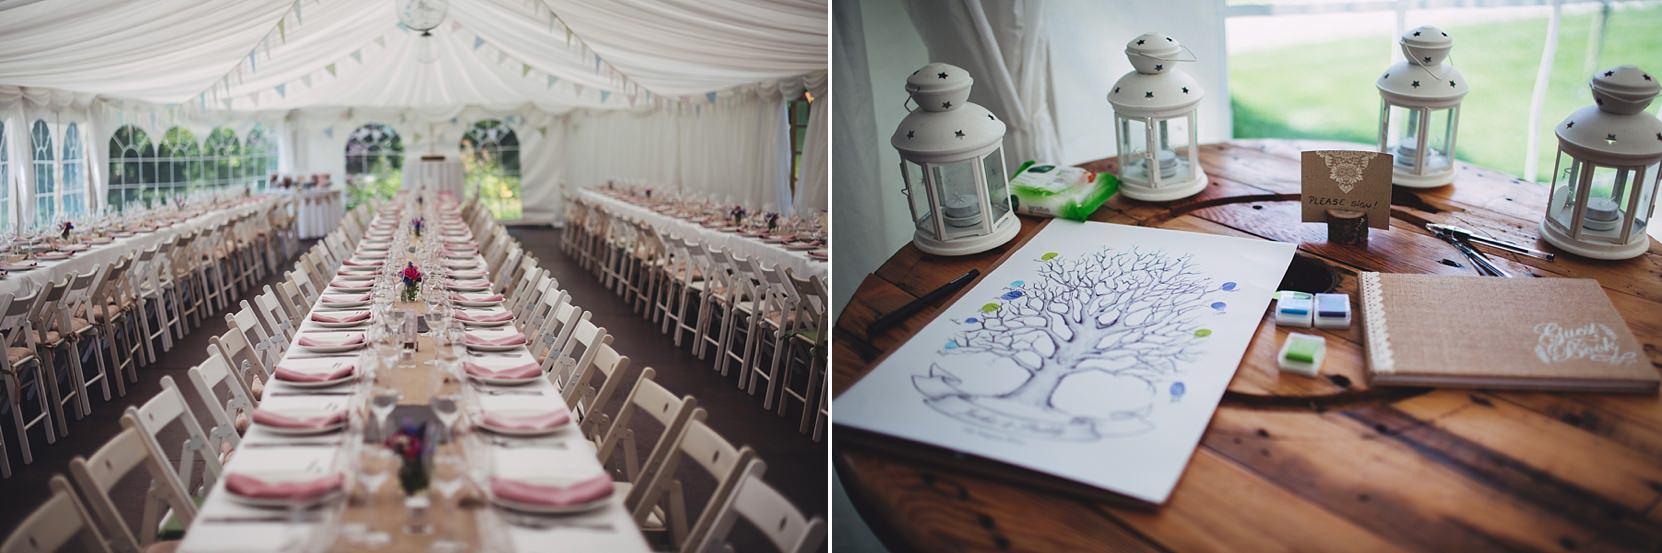 Cloughjordan-Wedding-Photography_0023